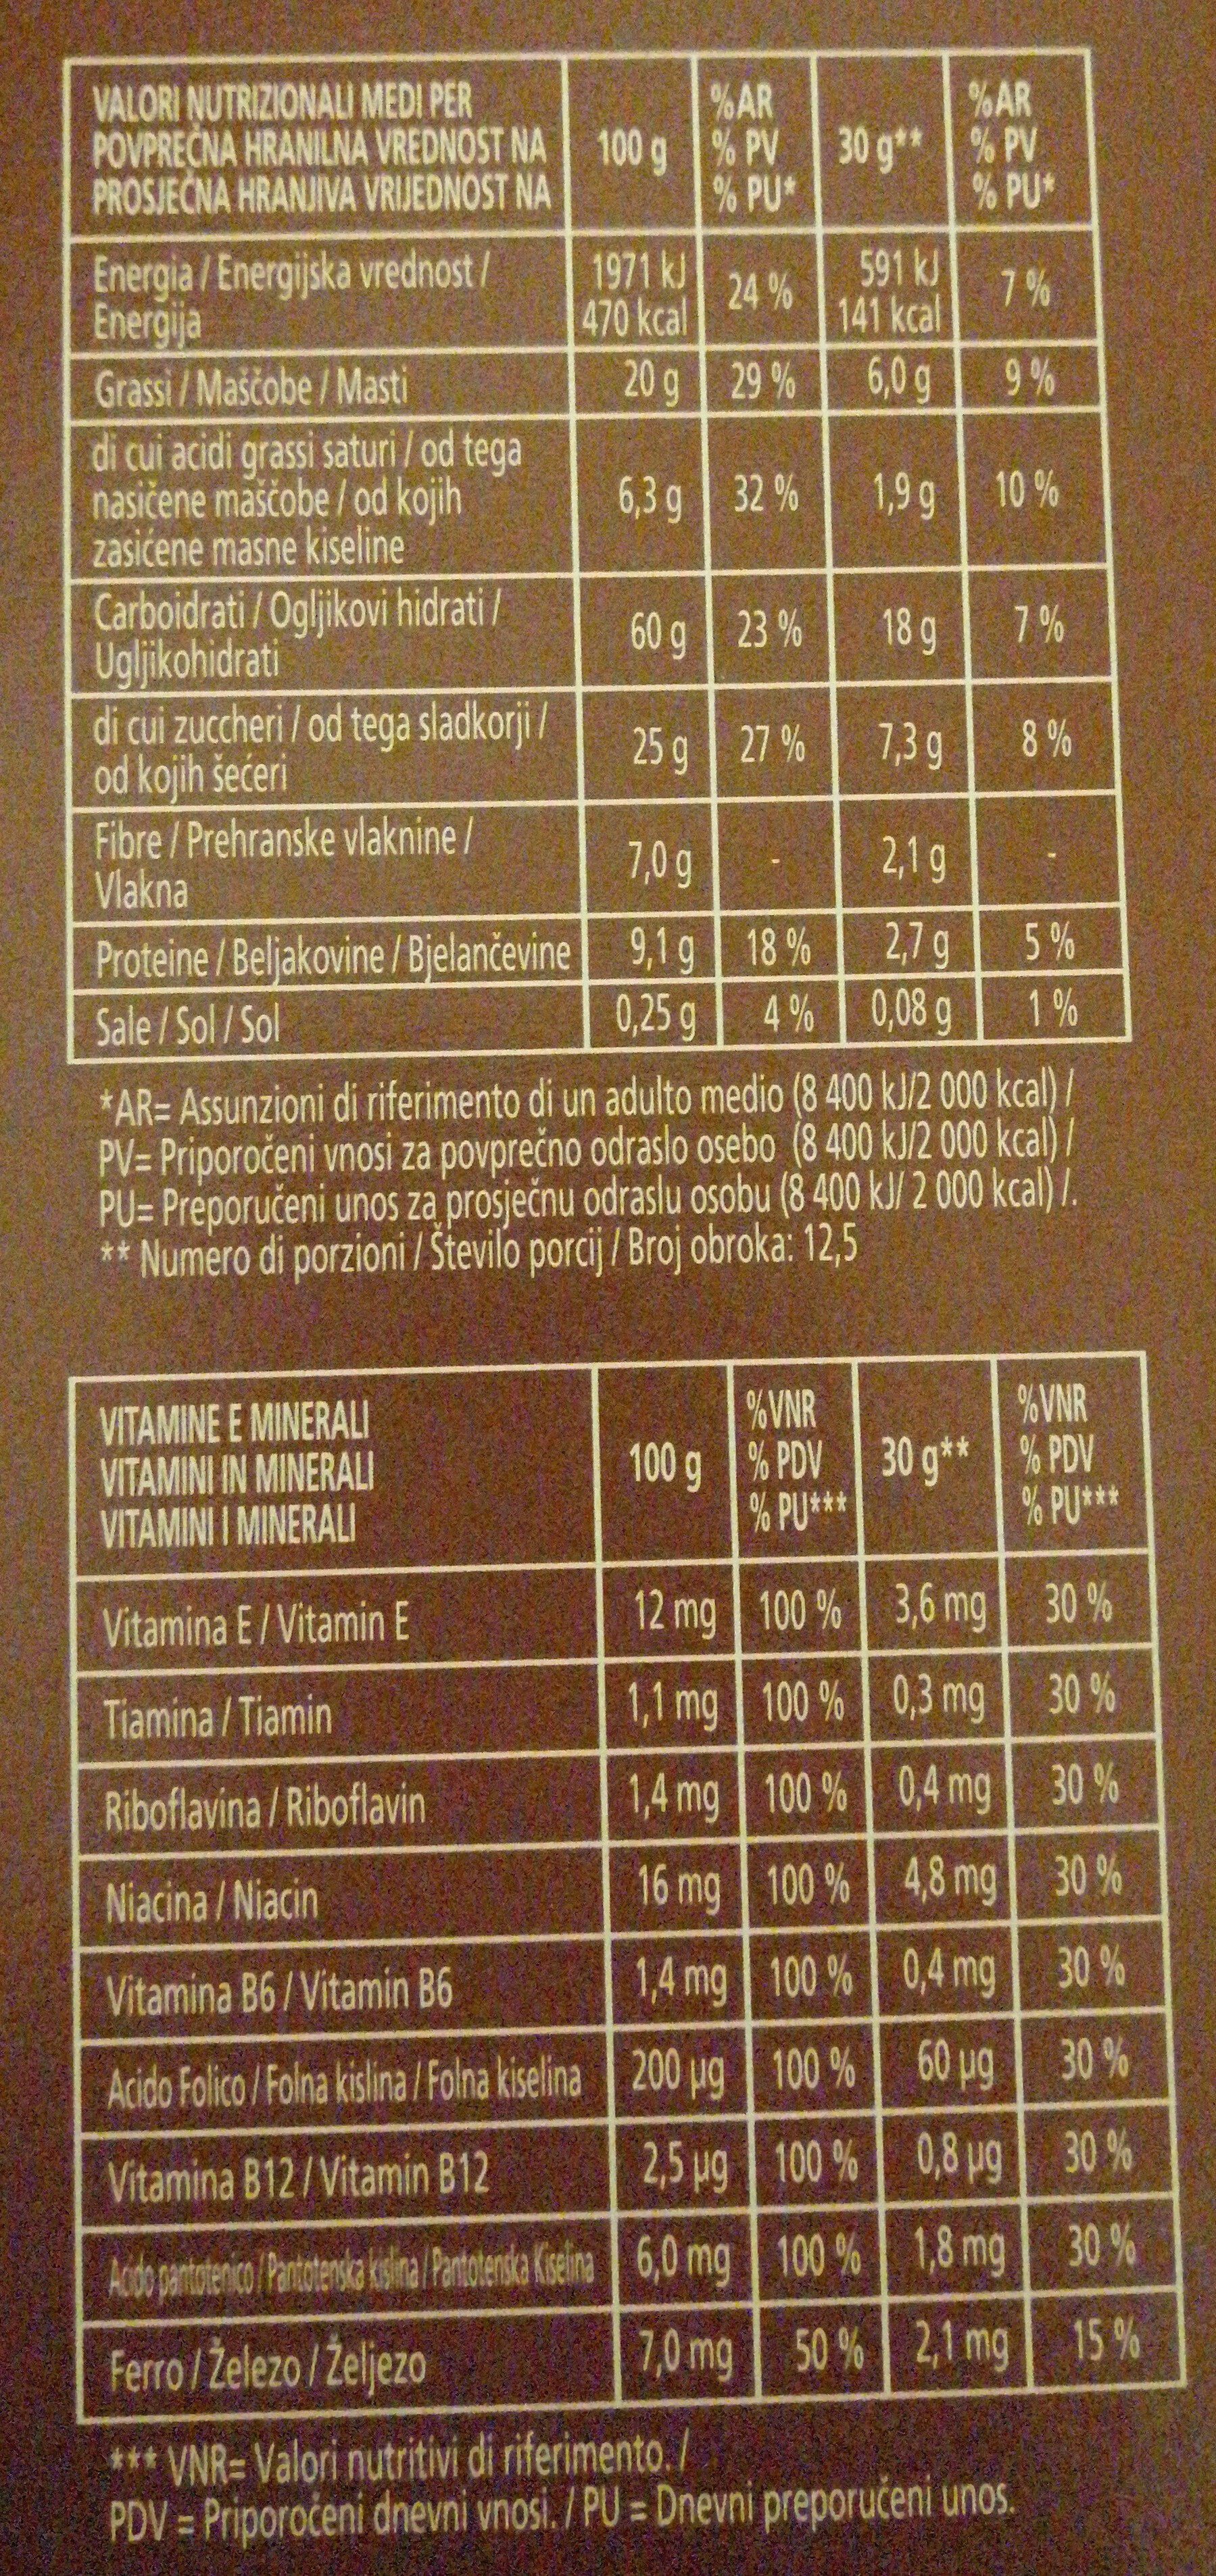 Muesli croccante al cioccolato e nocciole - Nutrition facts - fr